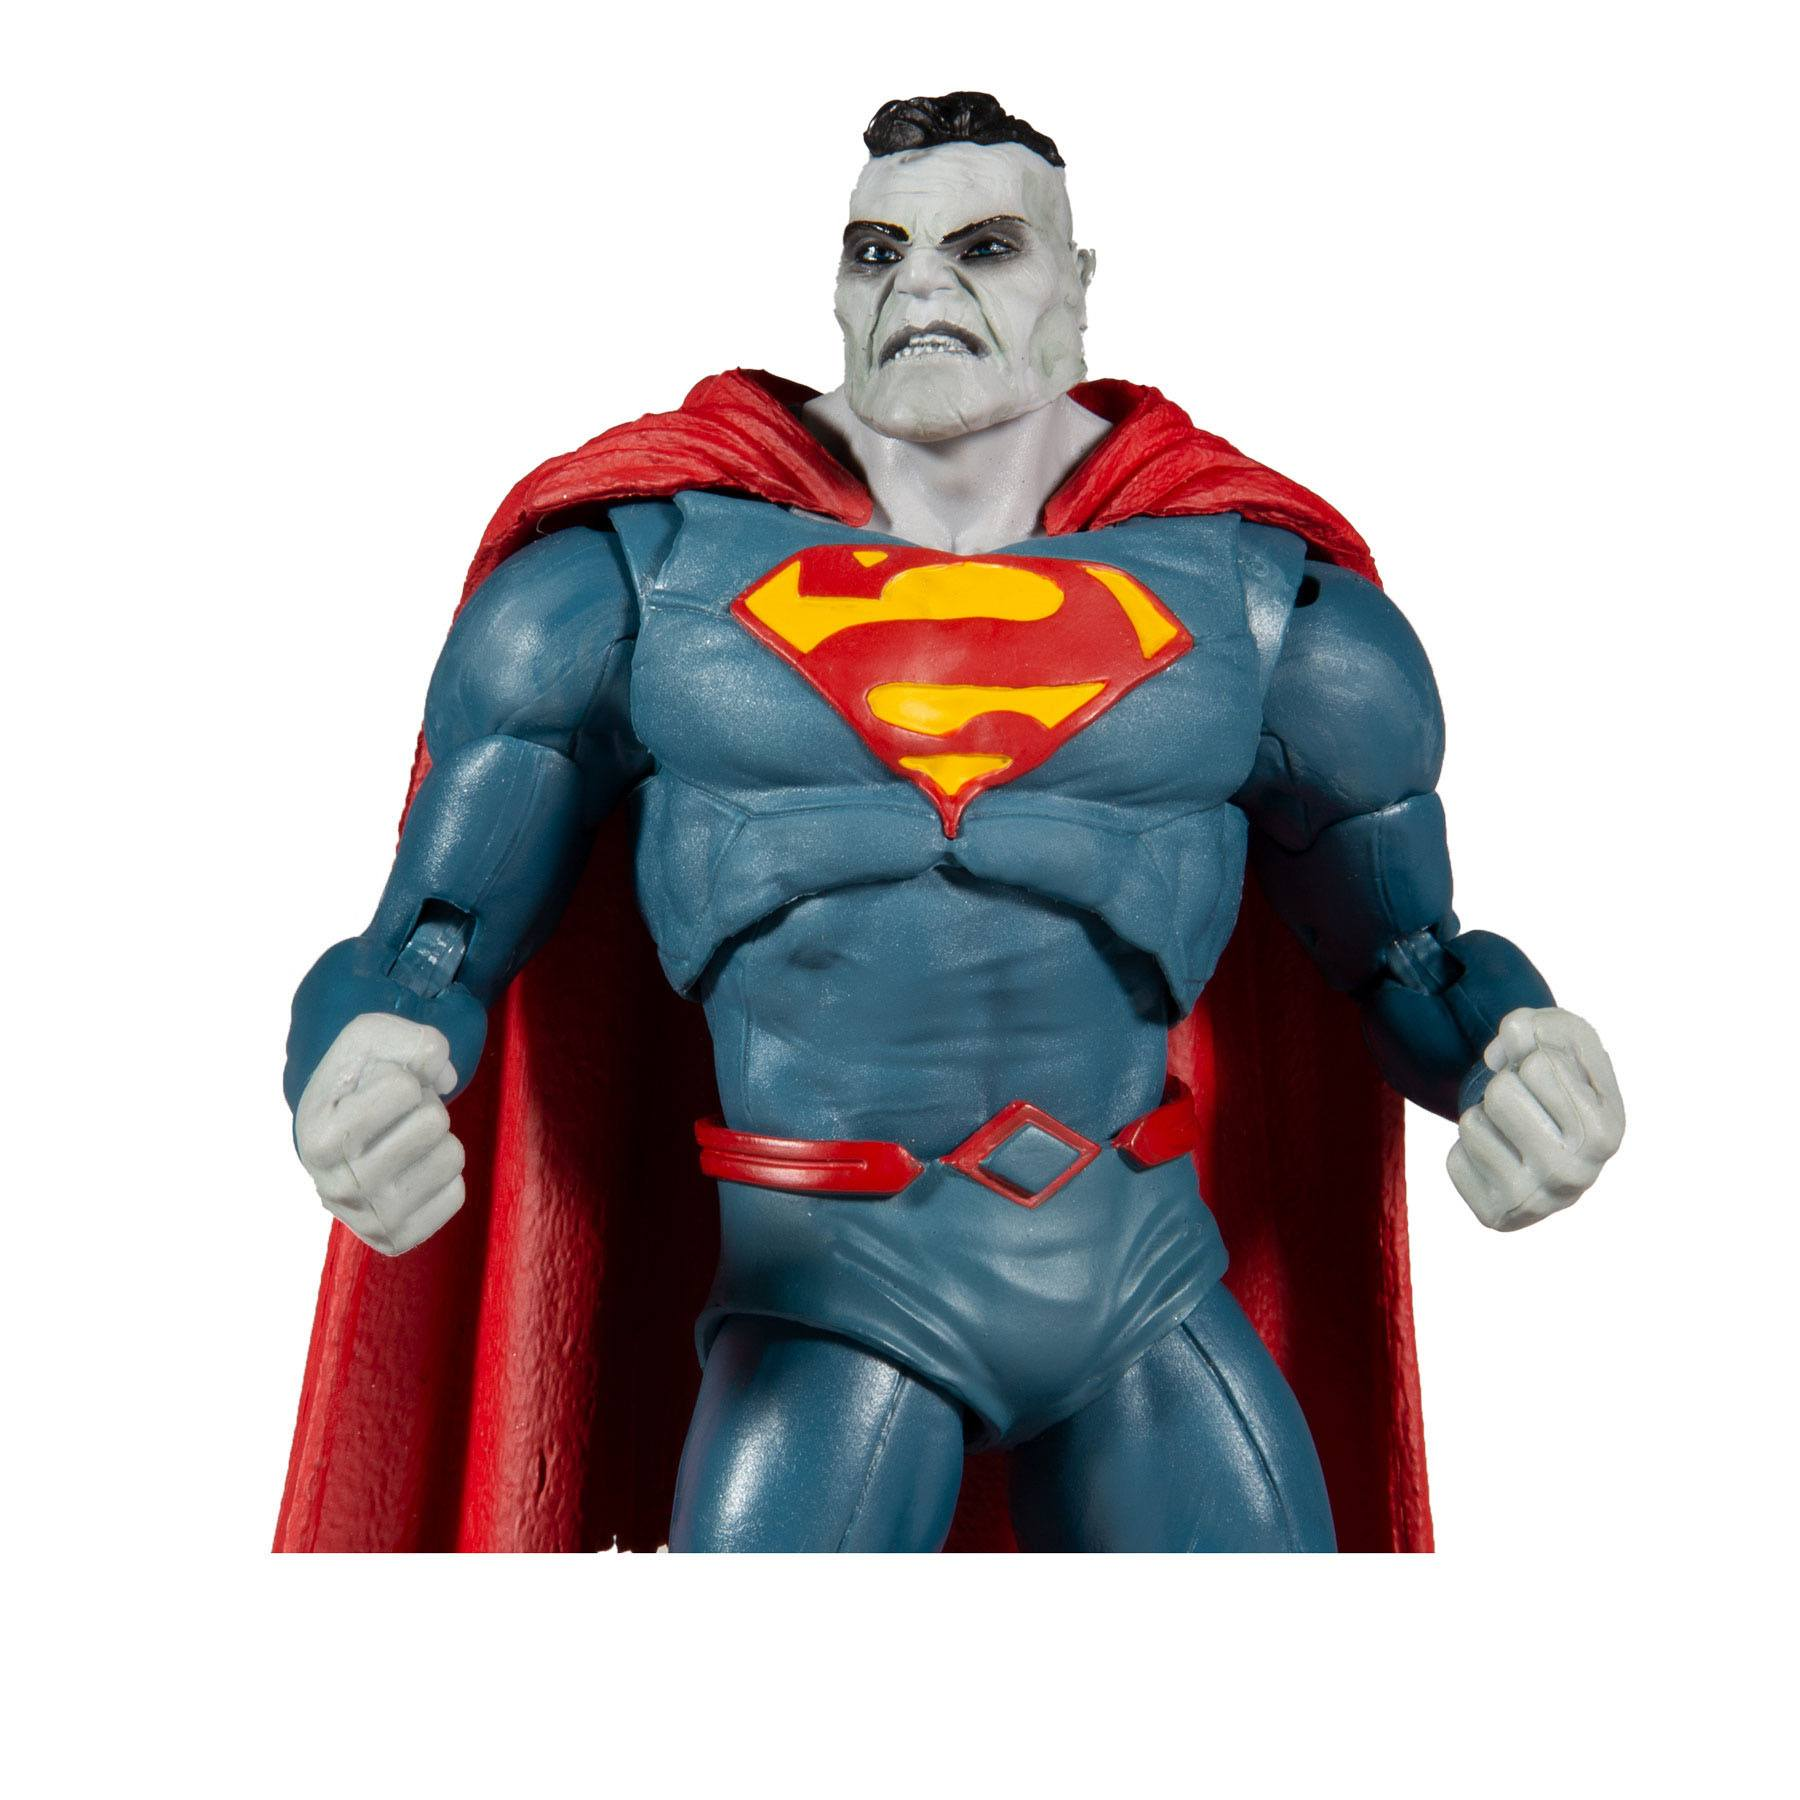 DC Multiverse Actionfigur Superman Bizarro (DC Rebirth) 18 cm MCF15145-9 787926151459